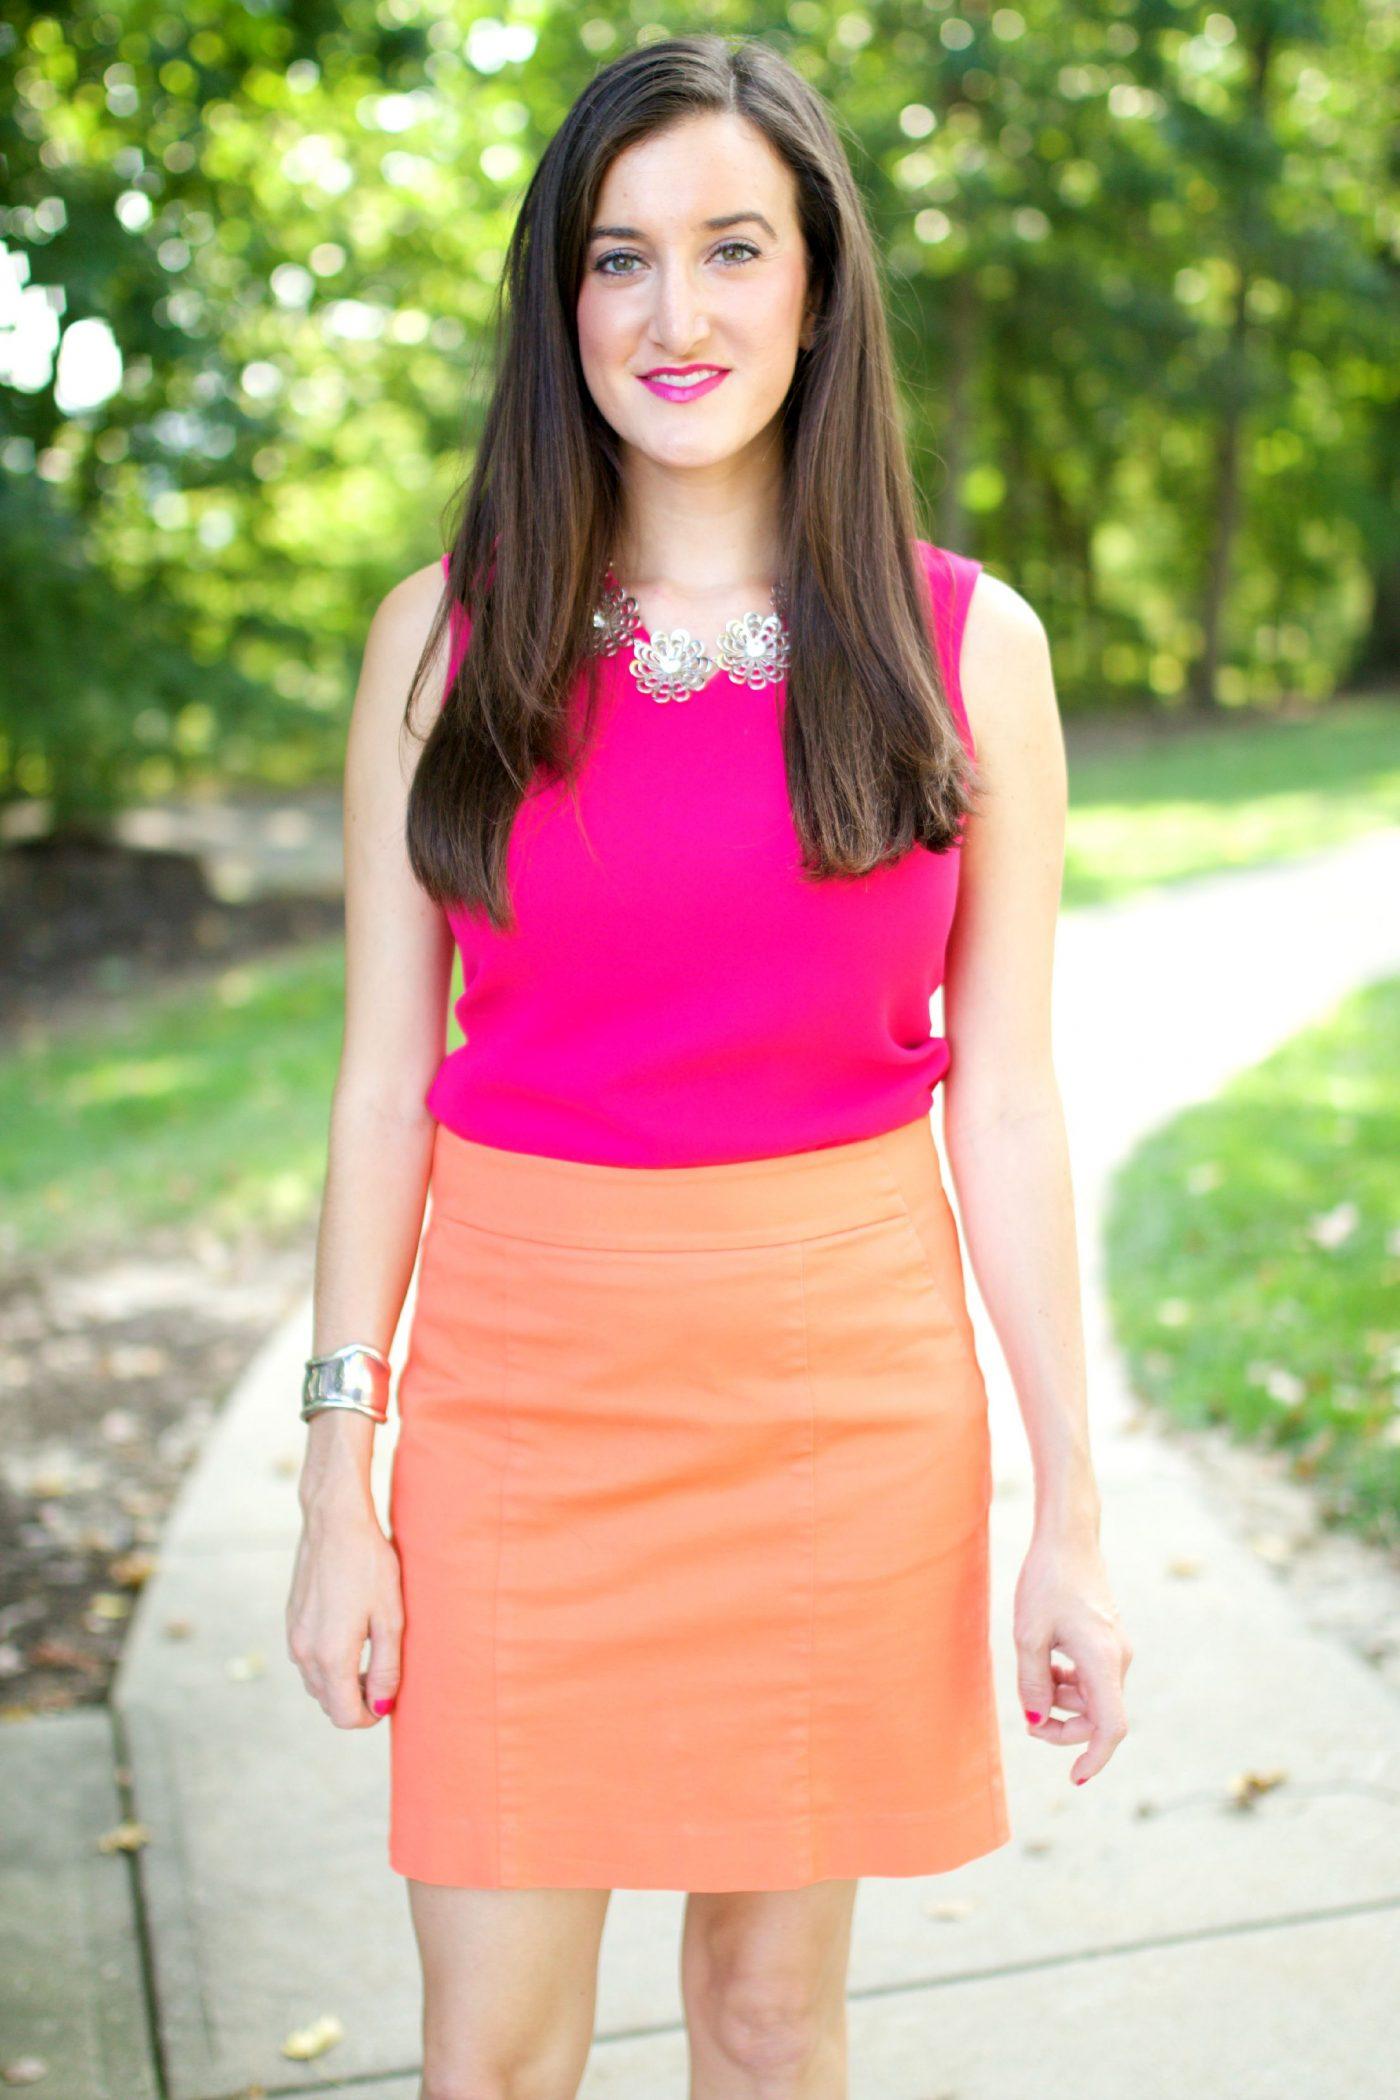 Orange Skirt with Pink Top